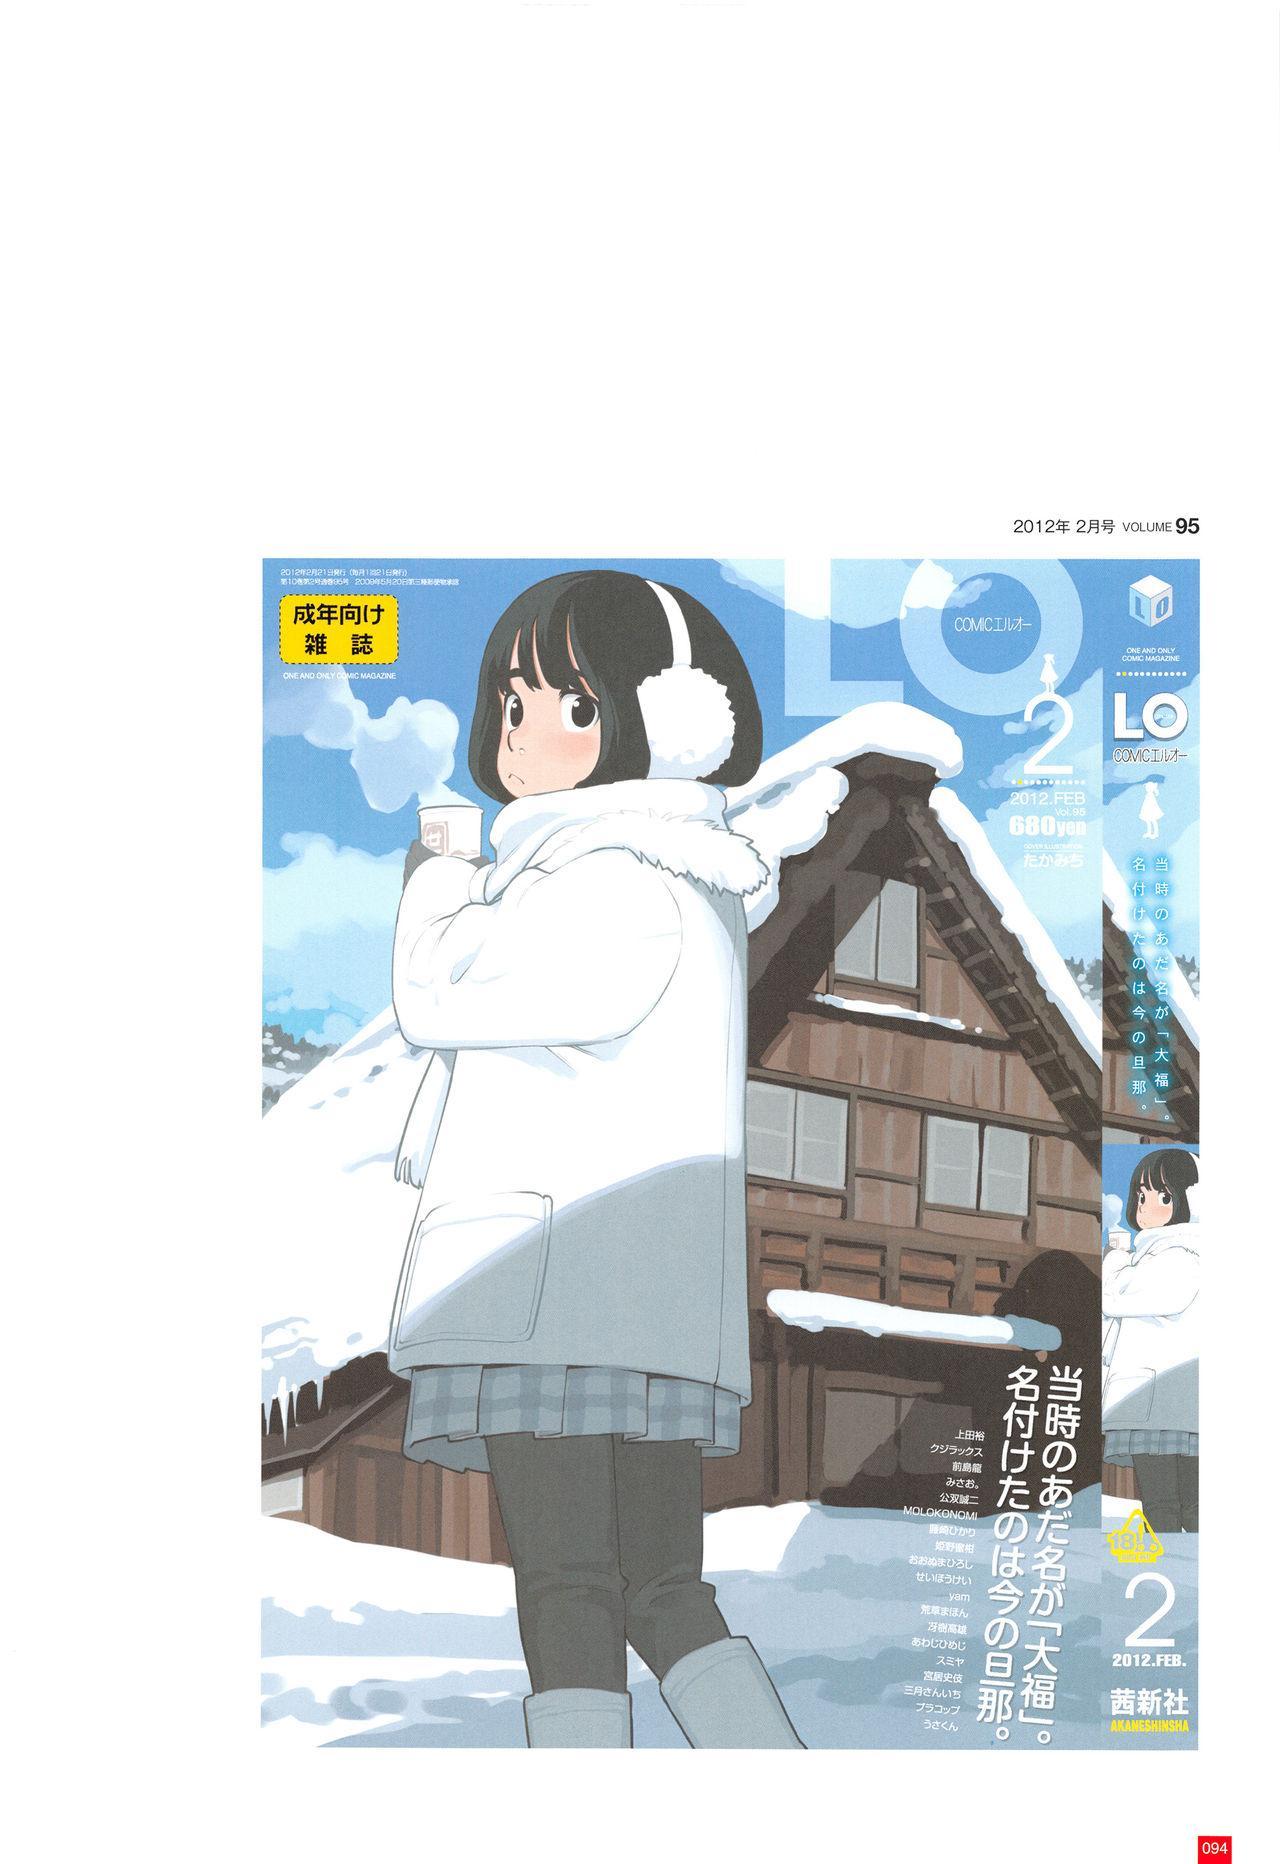 LO Artbook 2-A TAKAMICHI LOOP WORKS 96